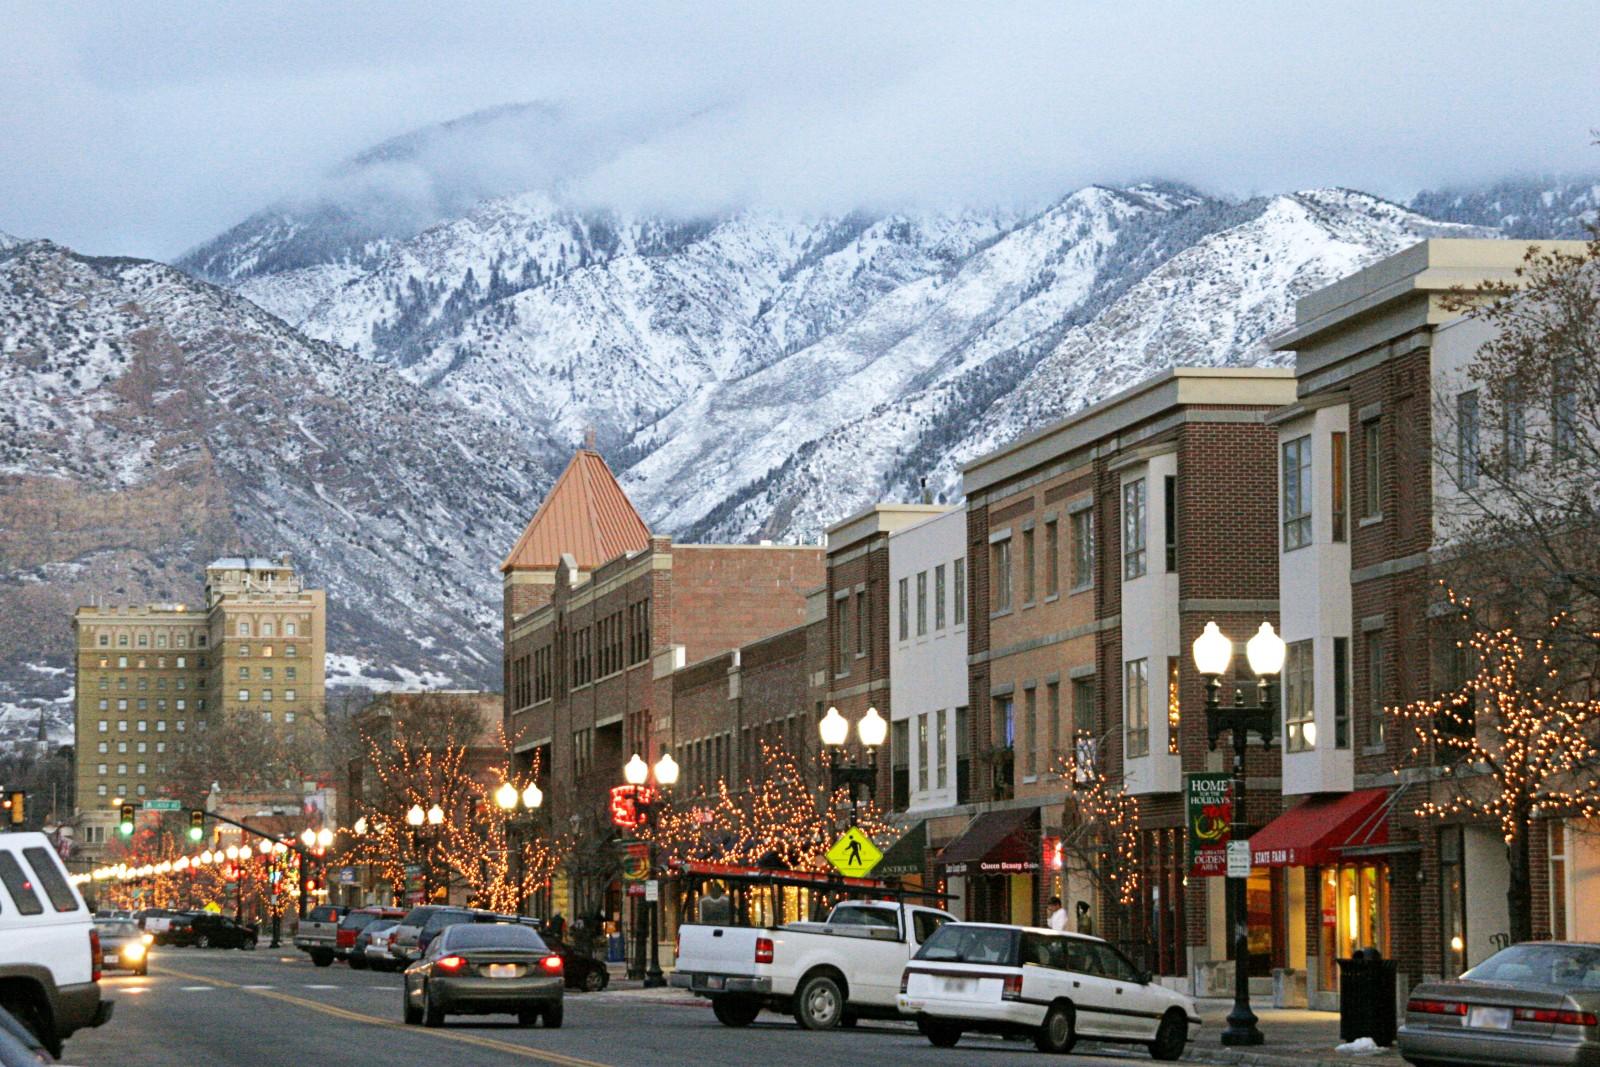 Downtown Ogden, Utah